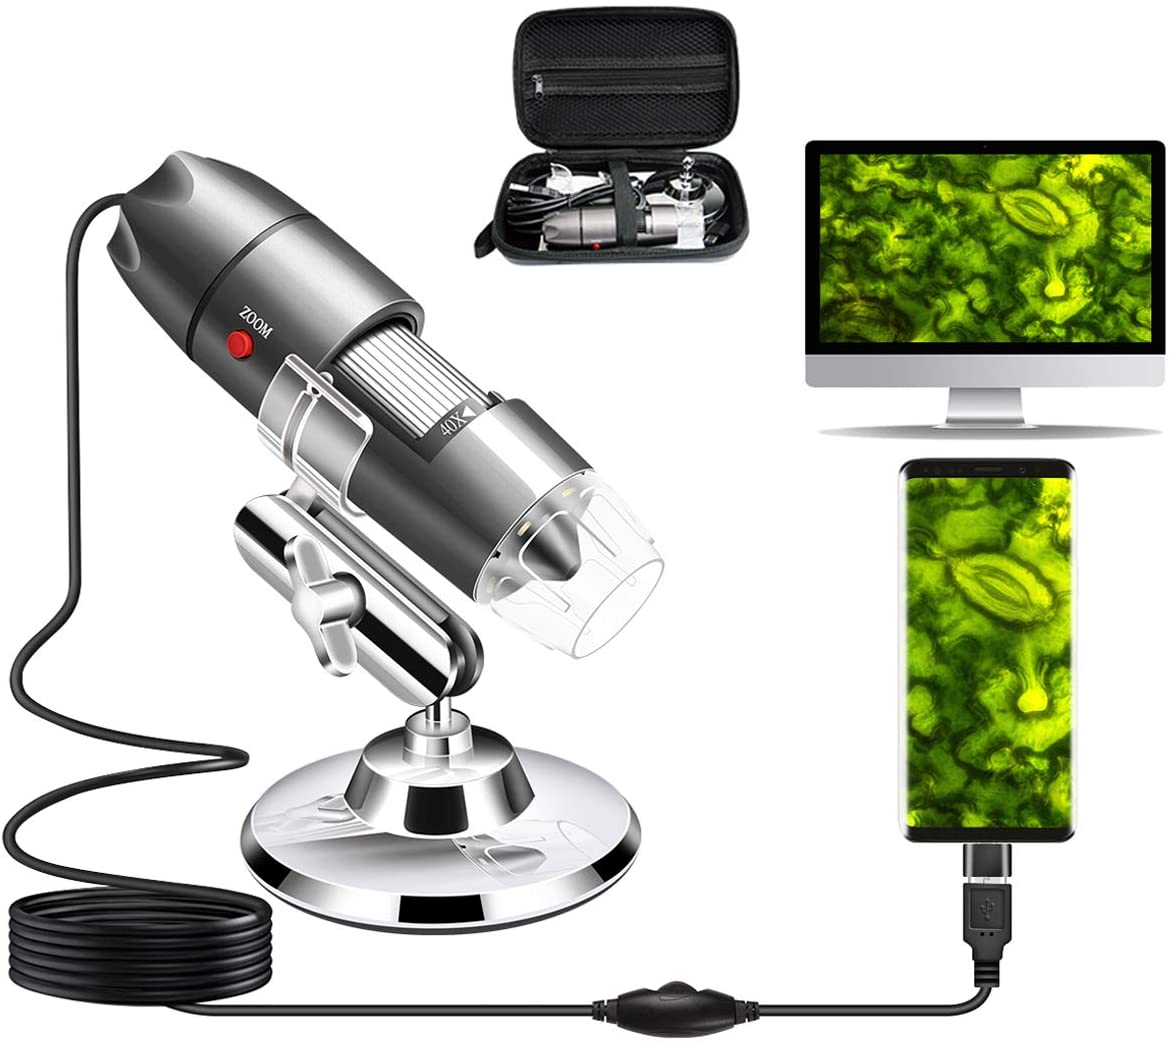 Review of Cainda Digital  Portable Microscope Camera - USB Microscope